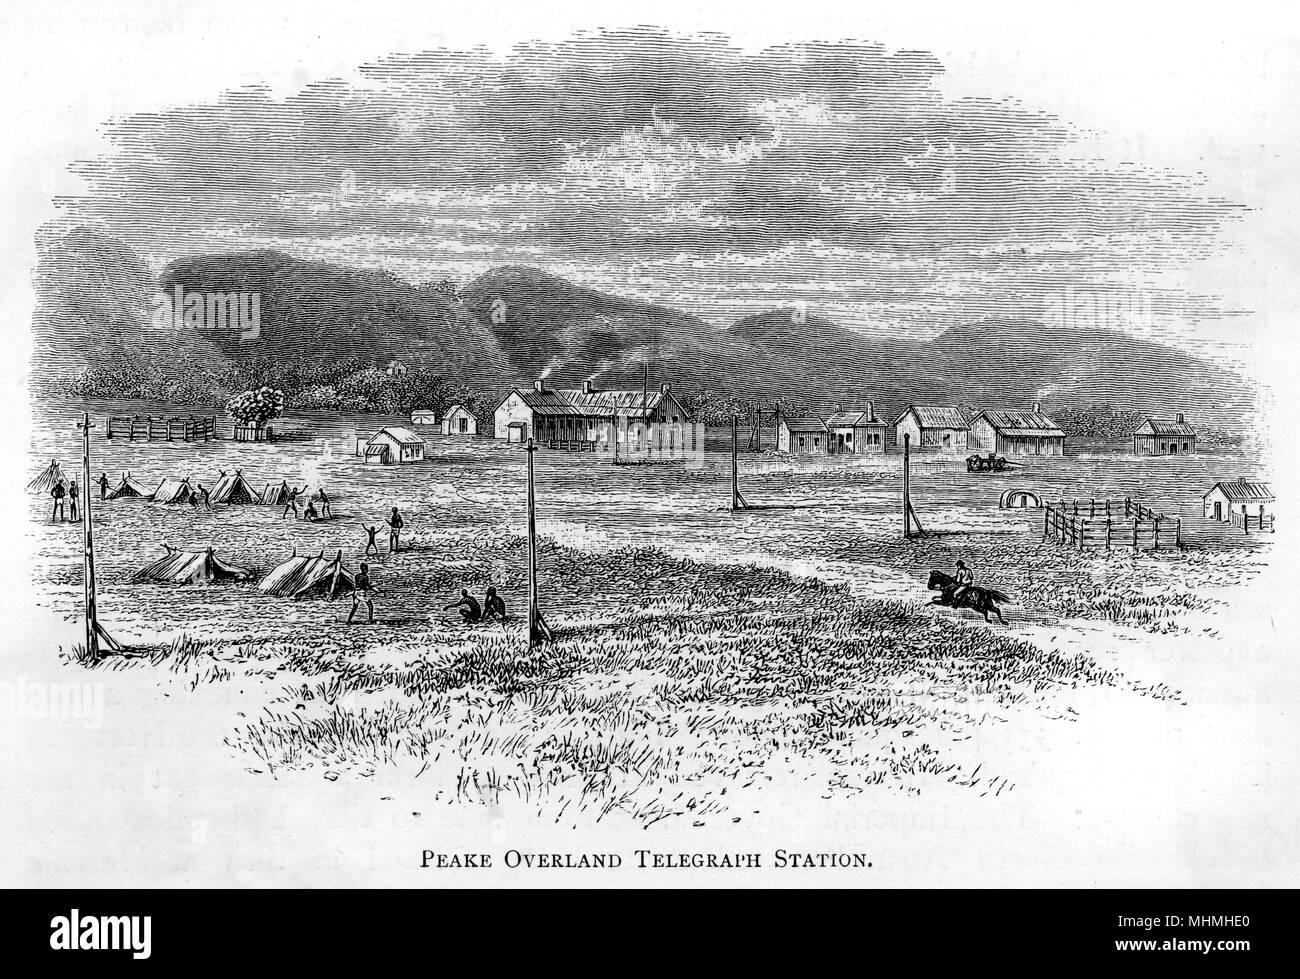 Peake Overland Telegraph Station, Australia. Data: Circa 1870 Immagini Stock